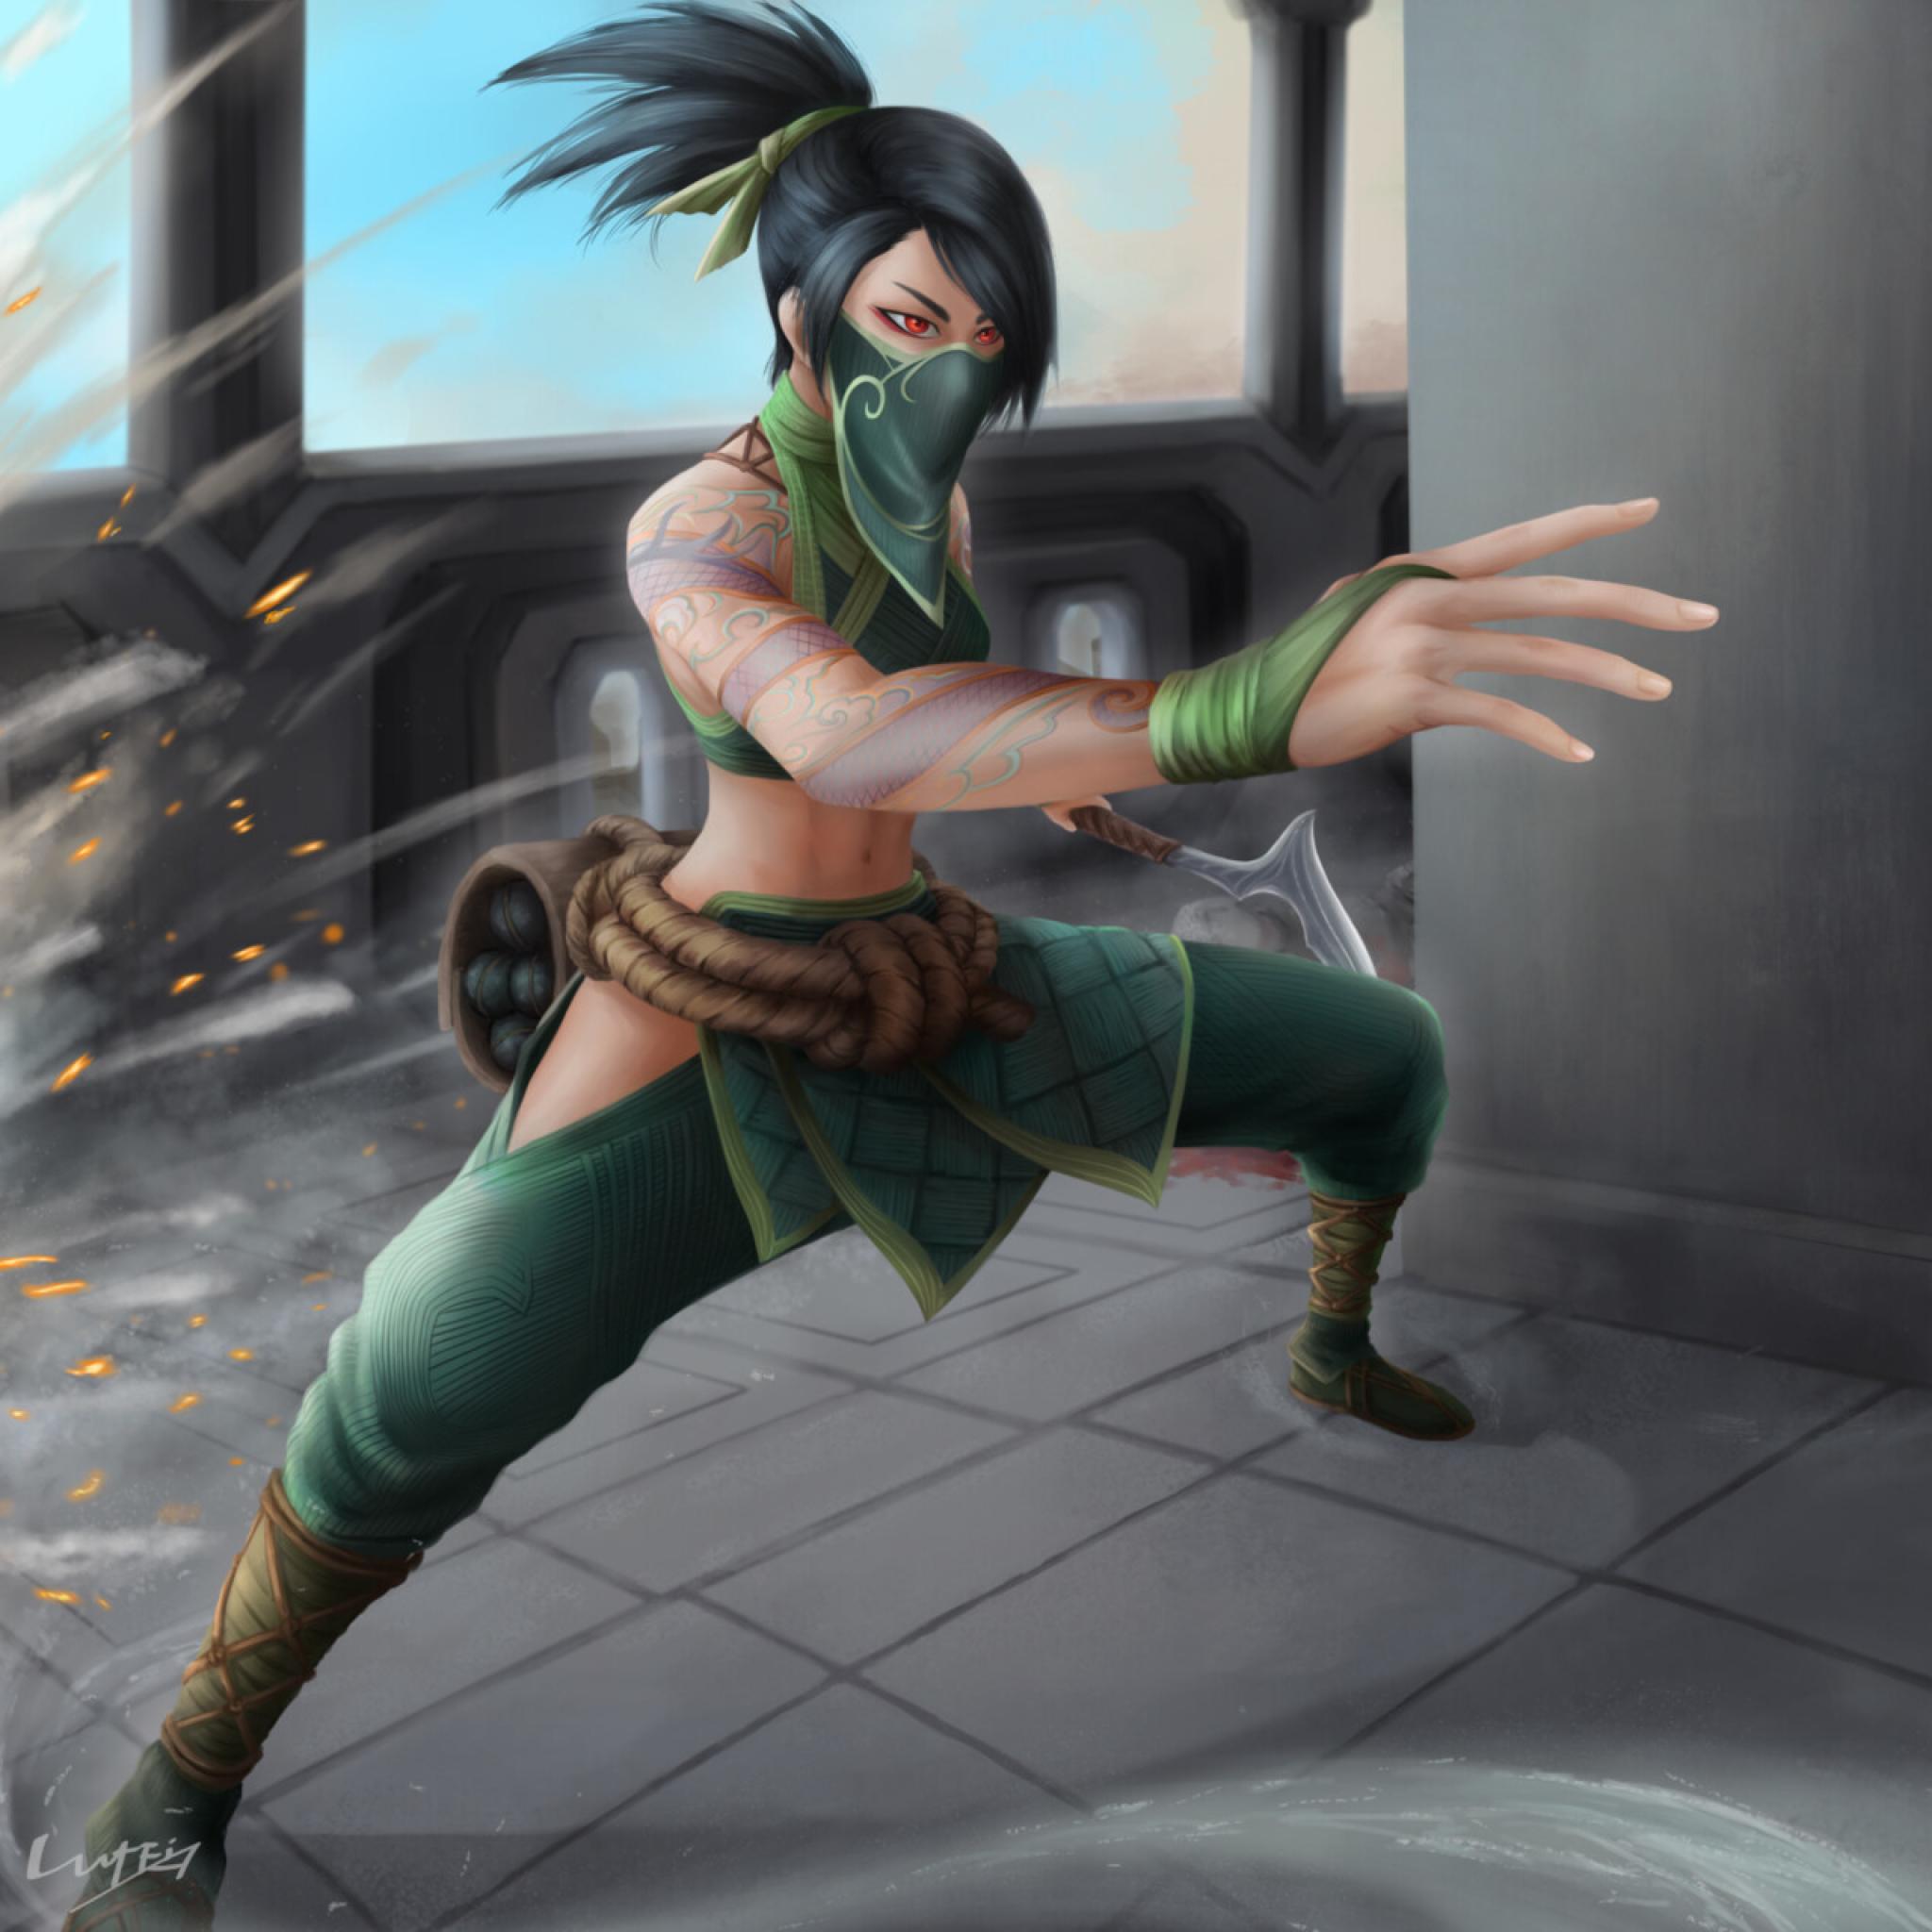 Akali from League Of Legends Wallpaper in 2048x2048 Resolution